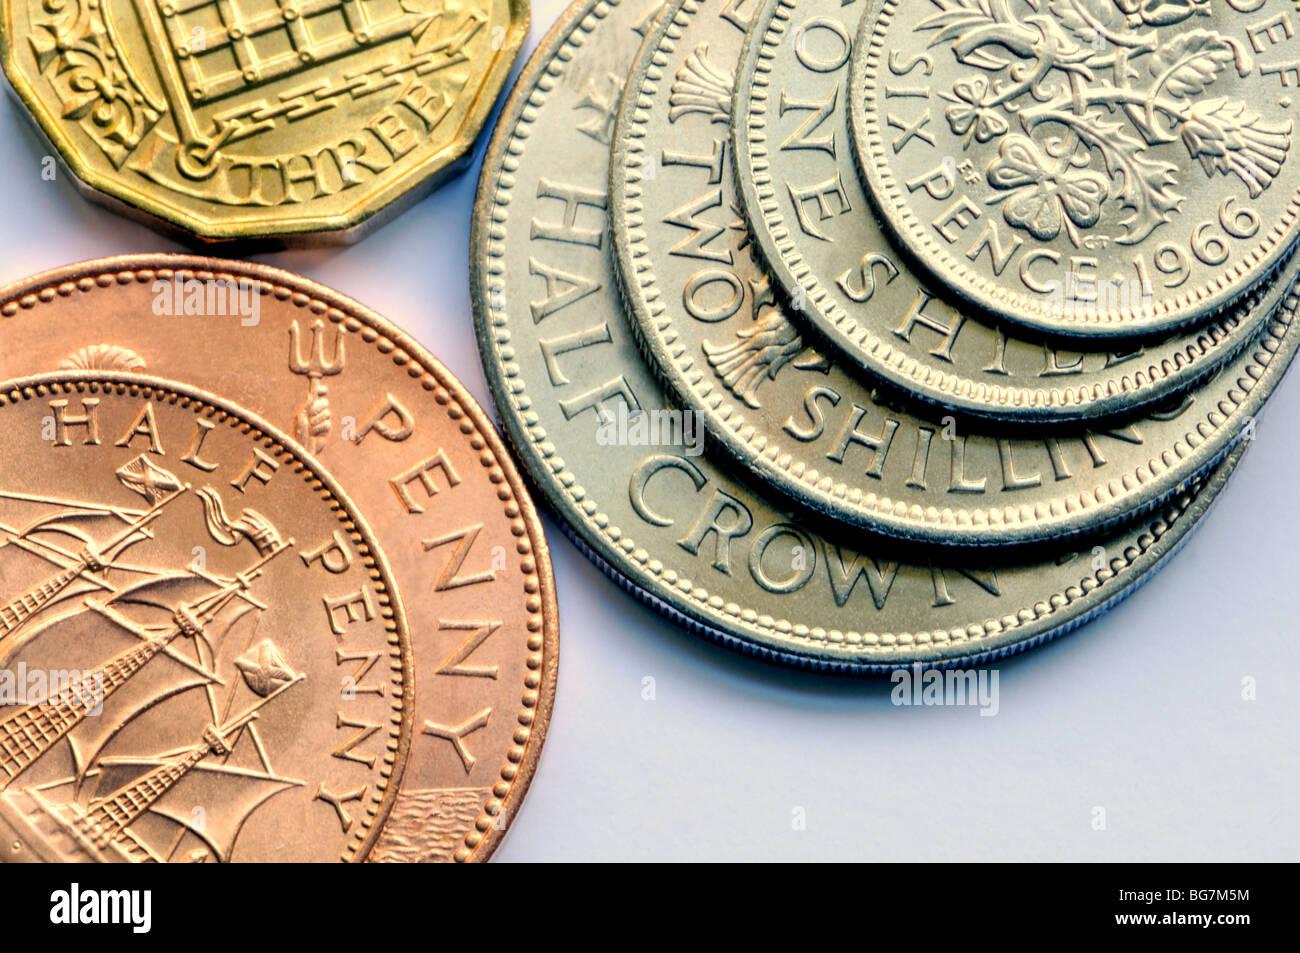 Pre Decimal Coin Images